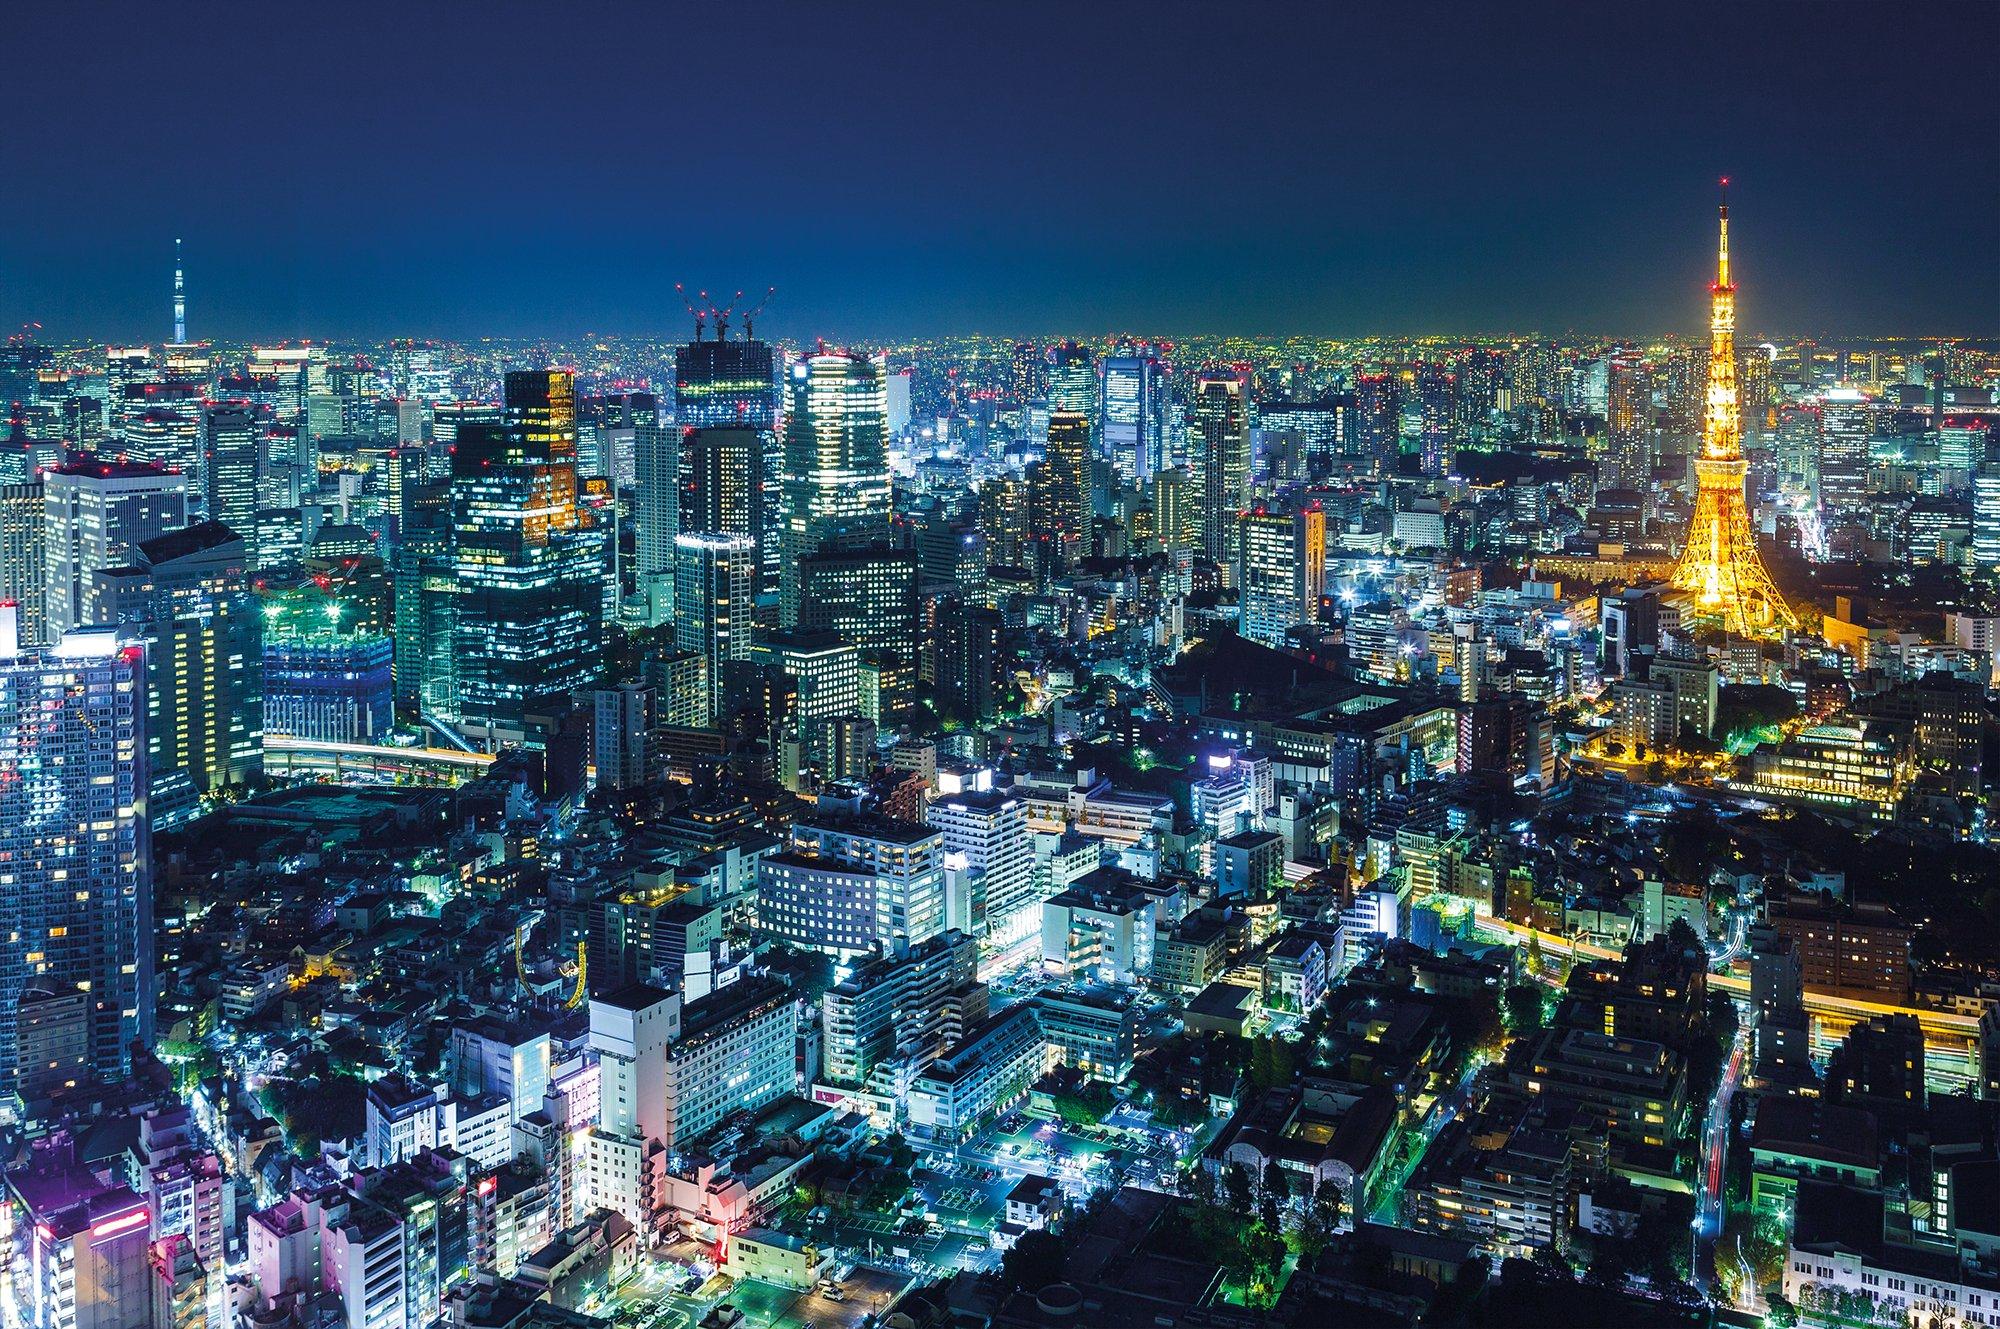 Wallpaper Tokyo City Mural Decoration Skyline Night Metropolis Tower Panorama Picture Japan Cosmopolitan